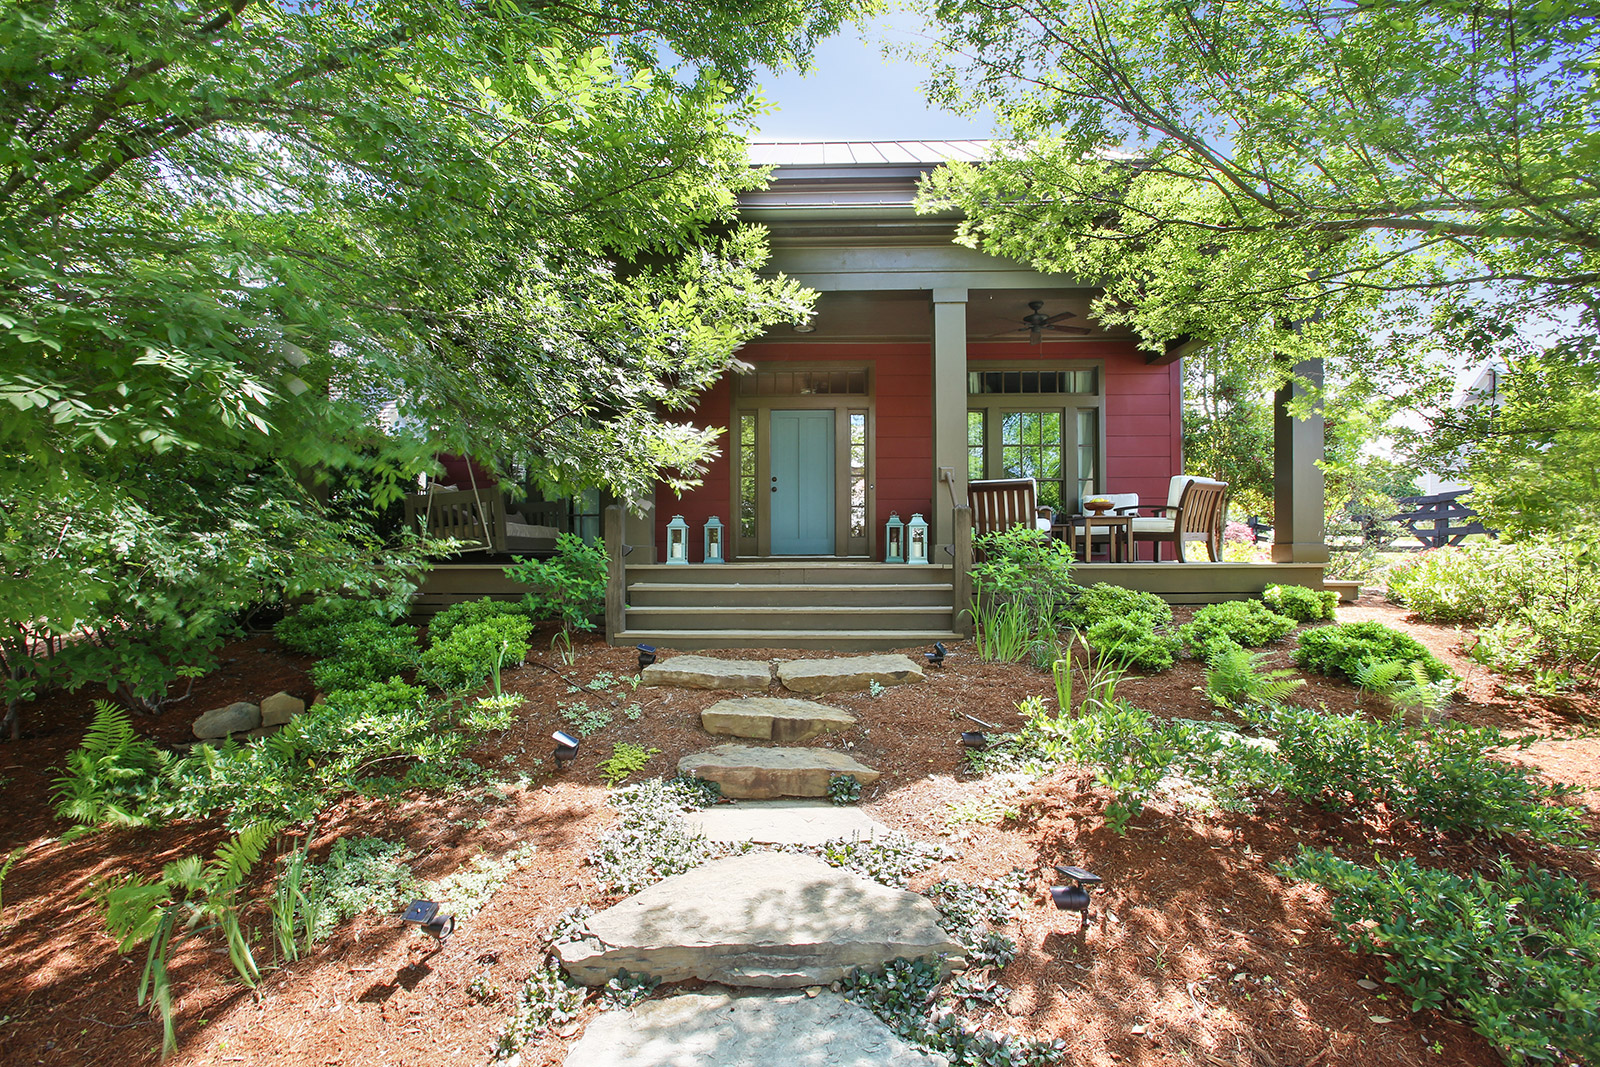 Palmetto House     5 Beds 3.5 Baths 2,541 SQFT    Serenbe Community    Chattahoochee Hills, GA